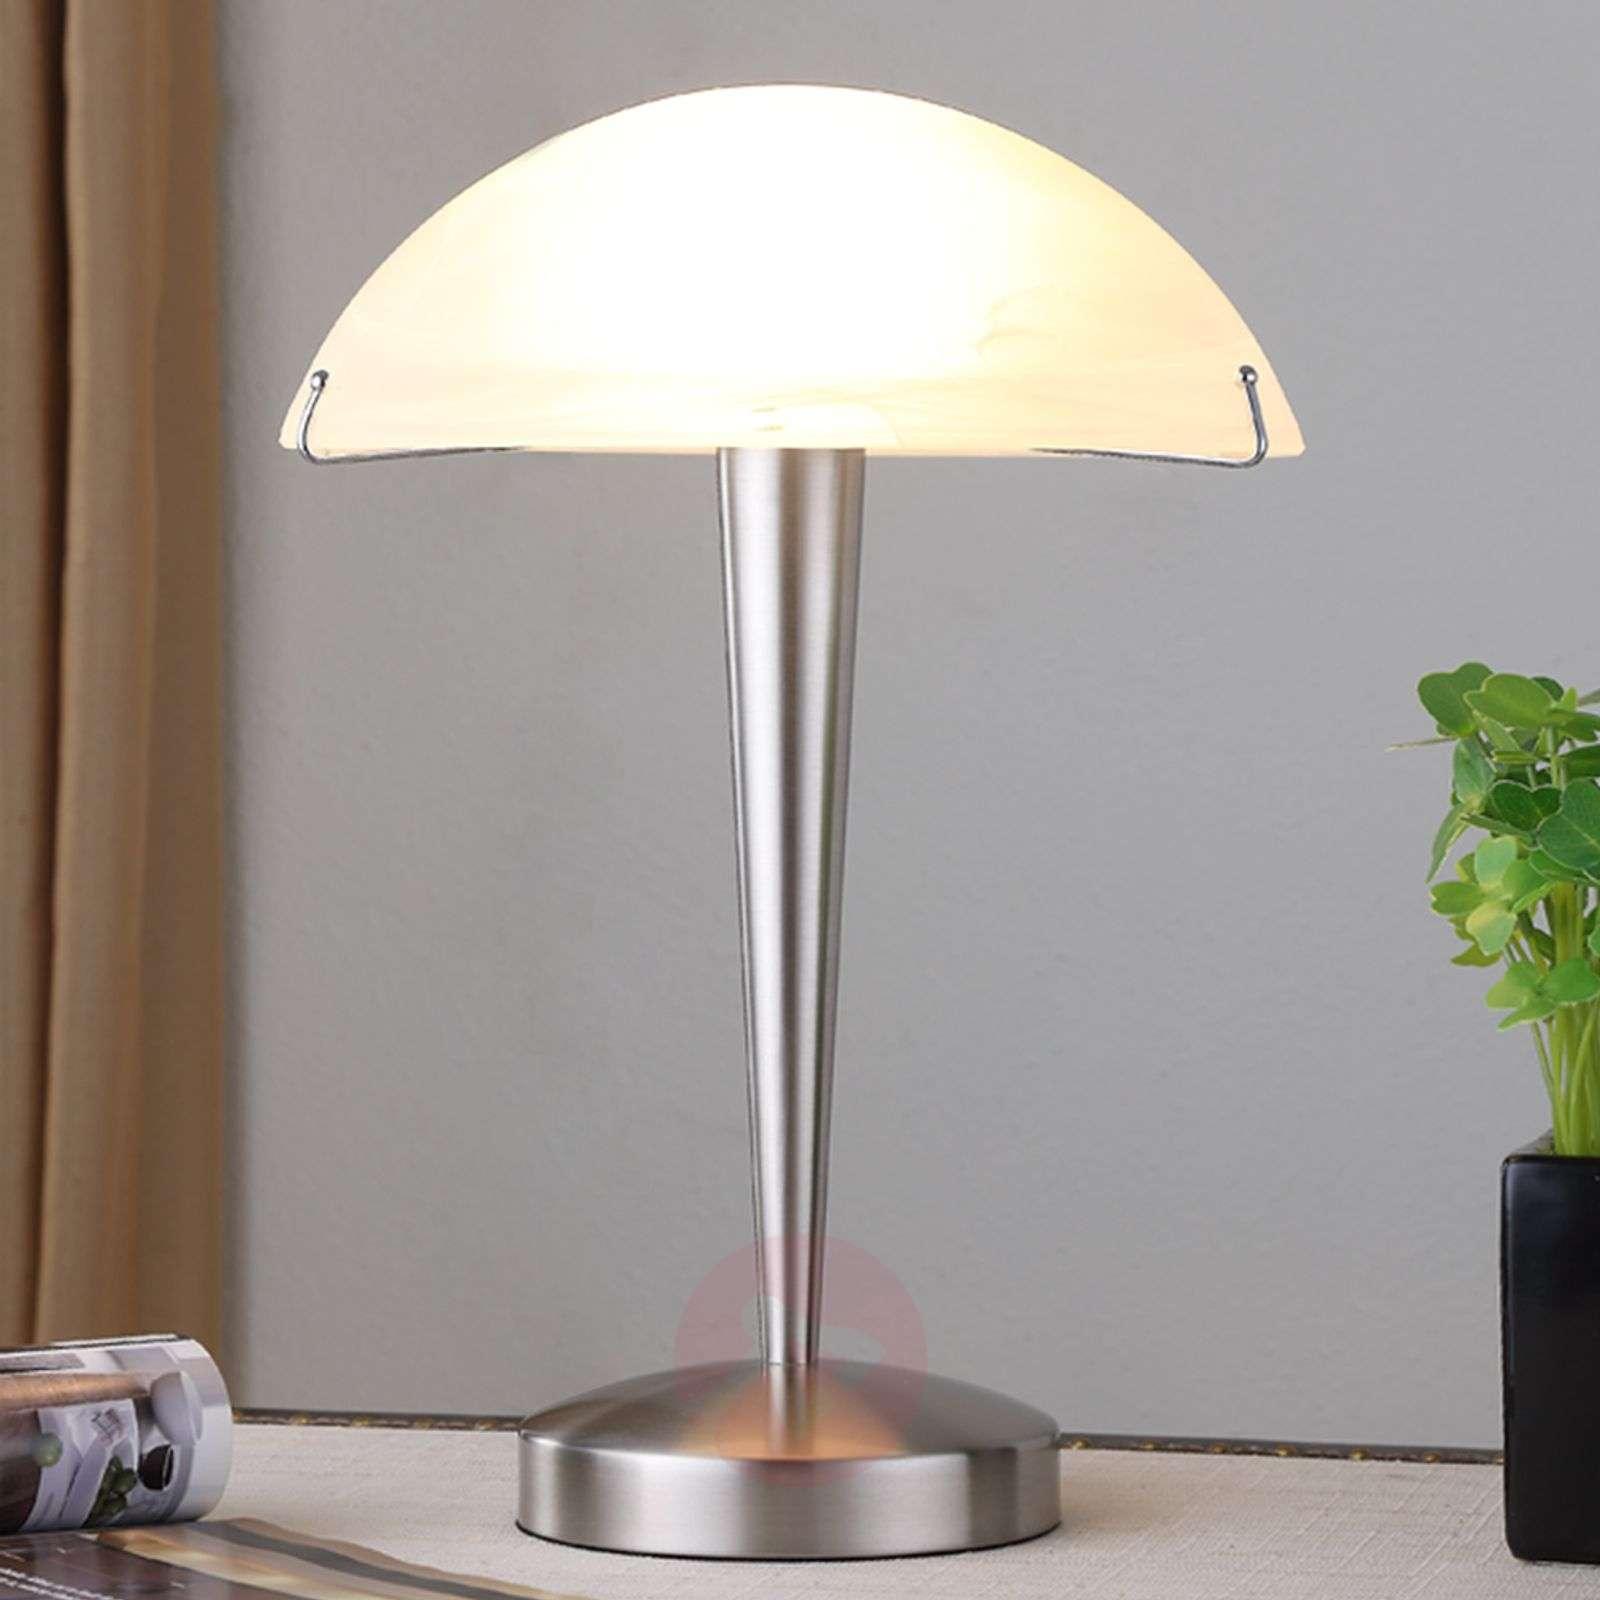 Attractive table lamp Viola, matt nickel-9620813-01